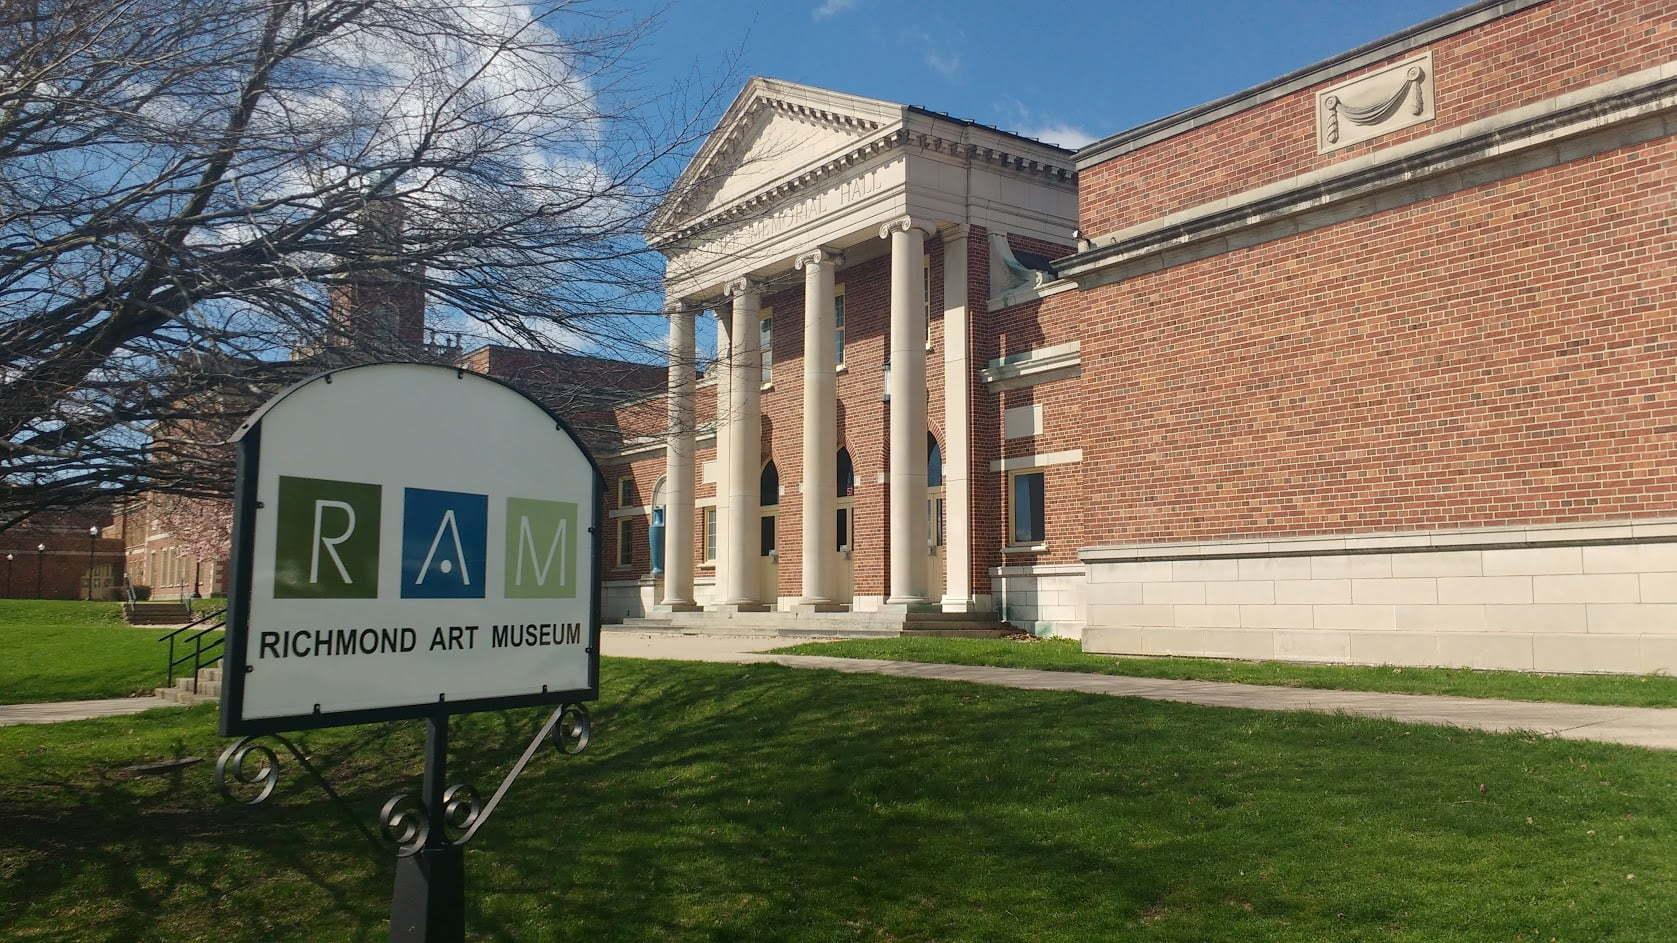 richmond art museum building